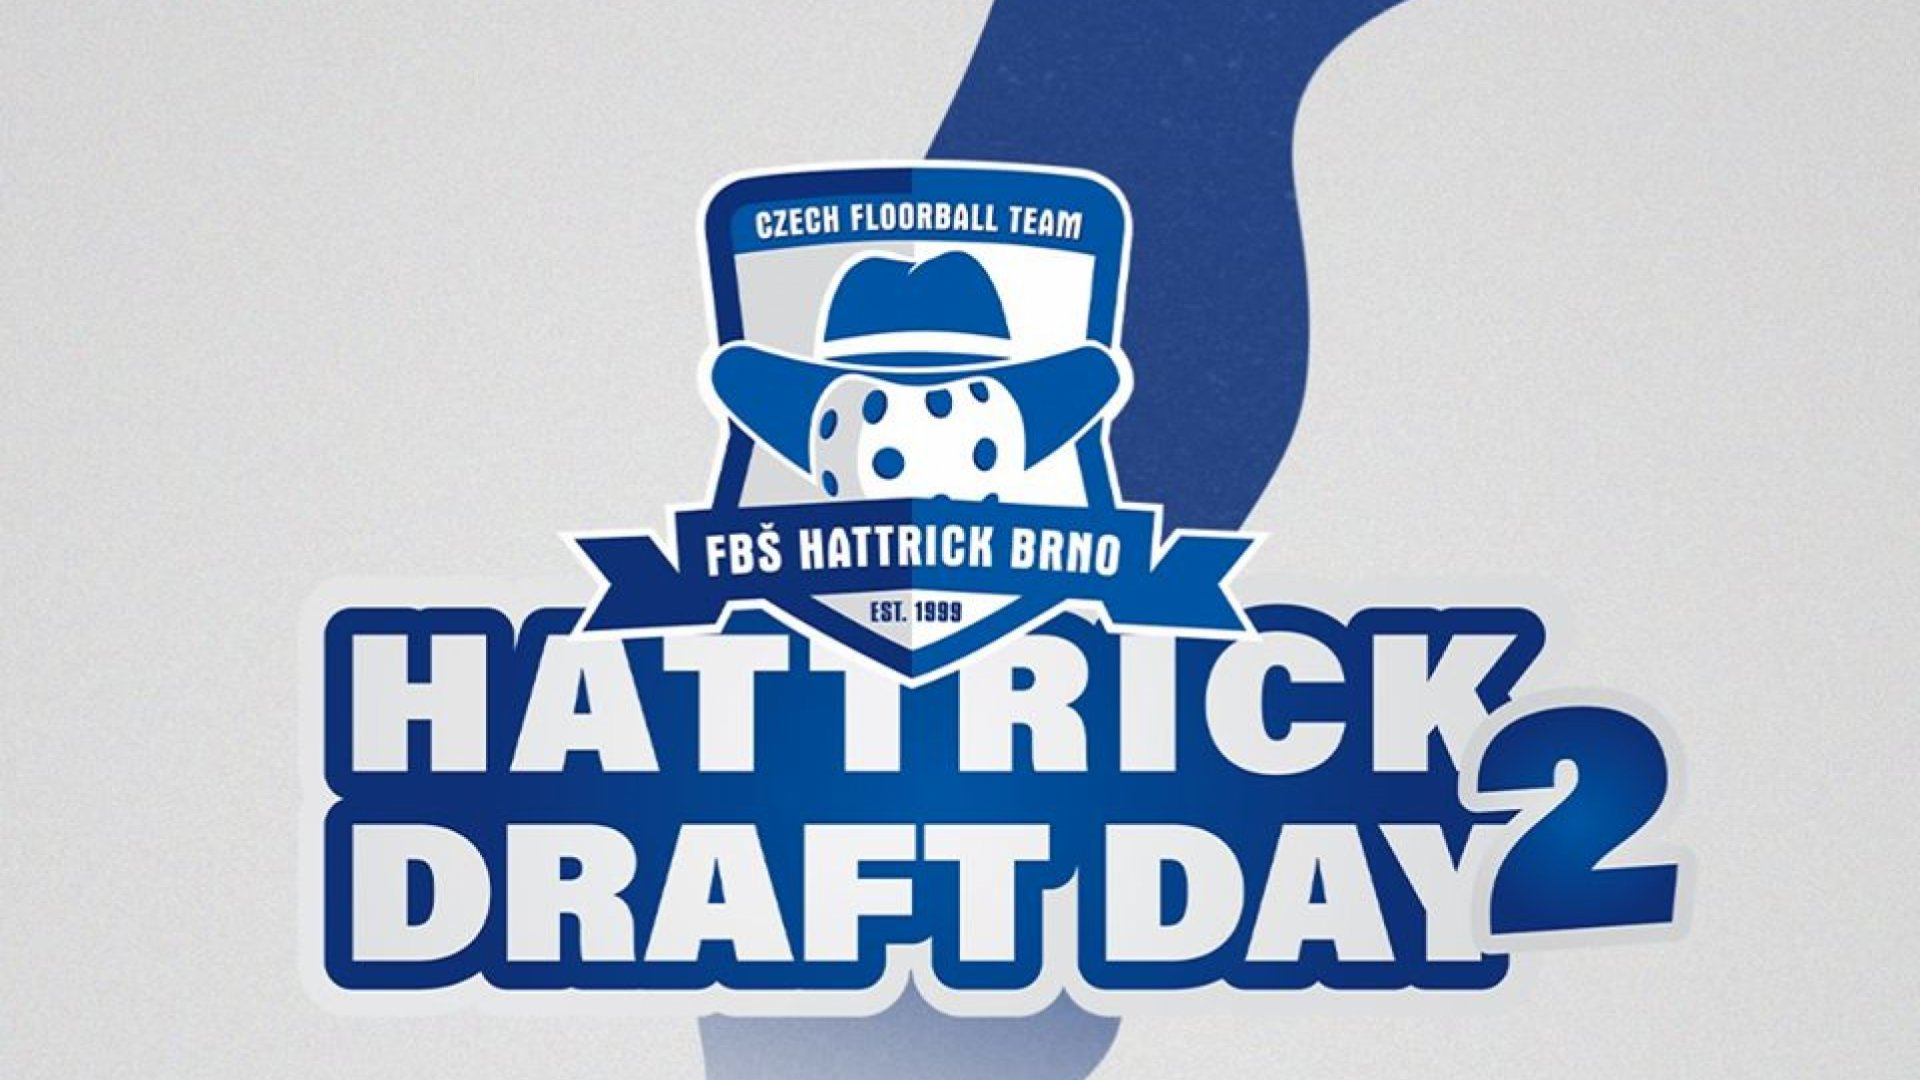 Klub nabíral talenty na Hattrick Draft Day 2020